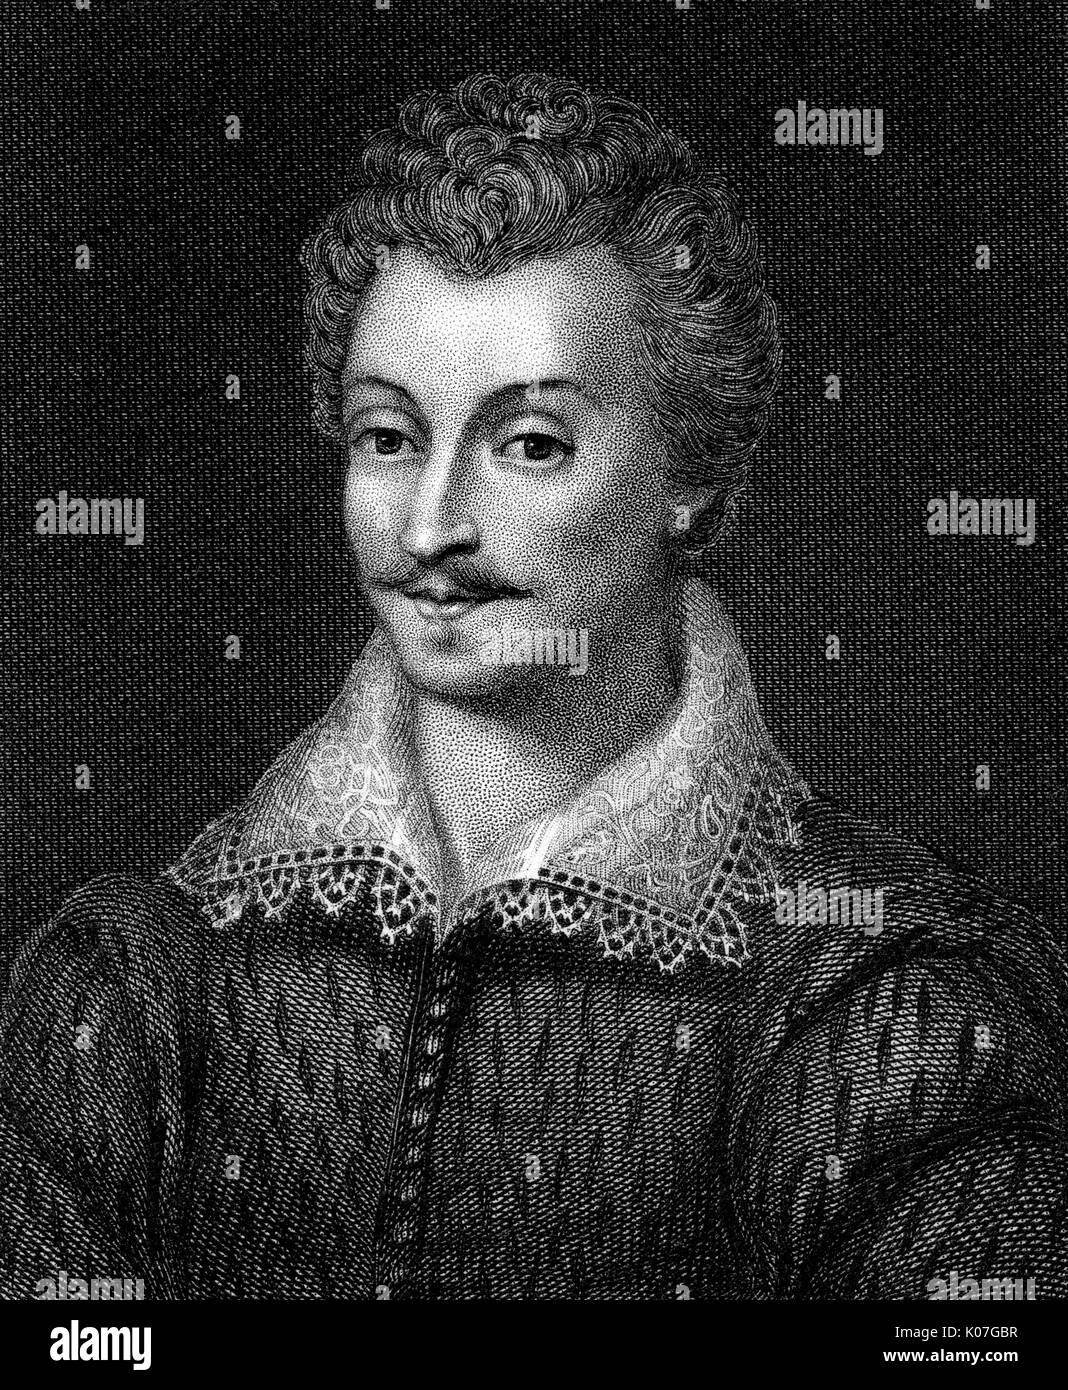 Sir Philip Sidney (1554 - 1586) - writer        Date: - Stock Image